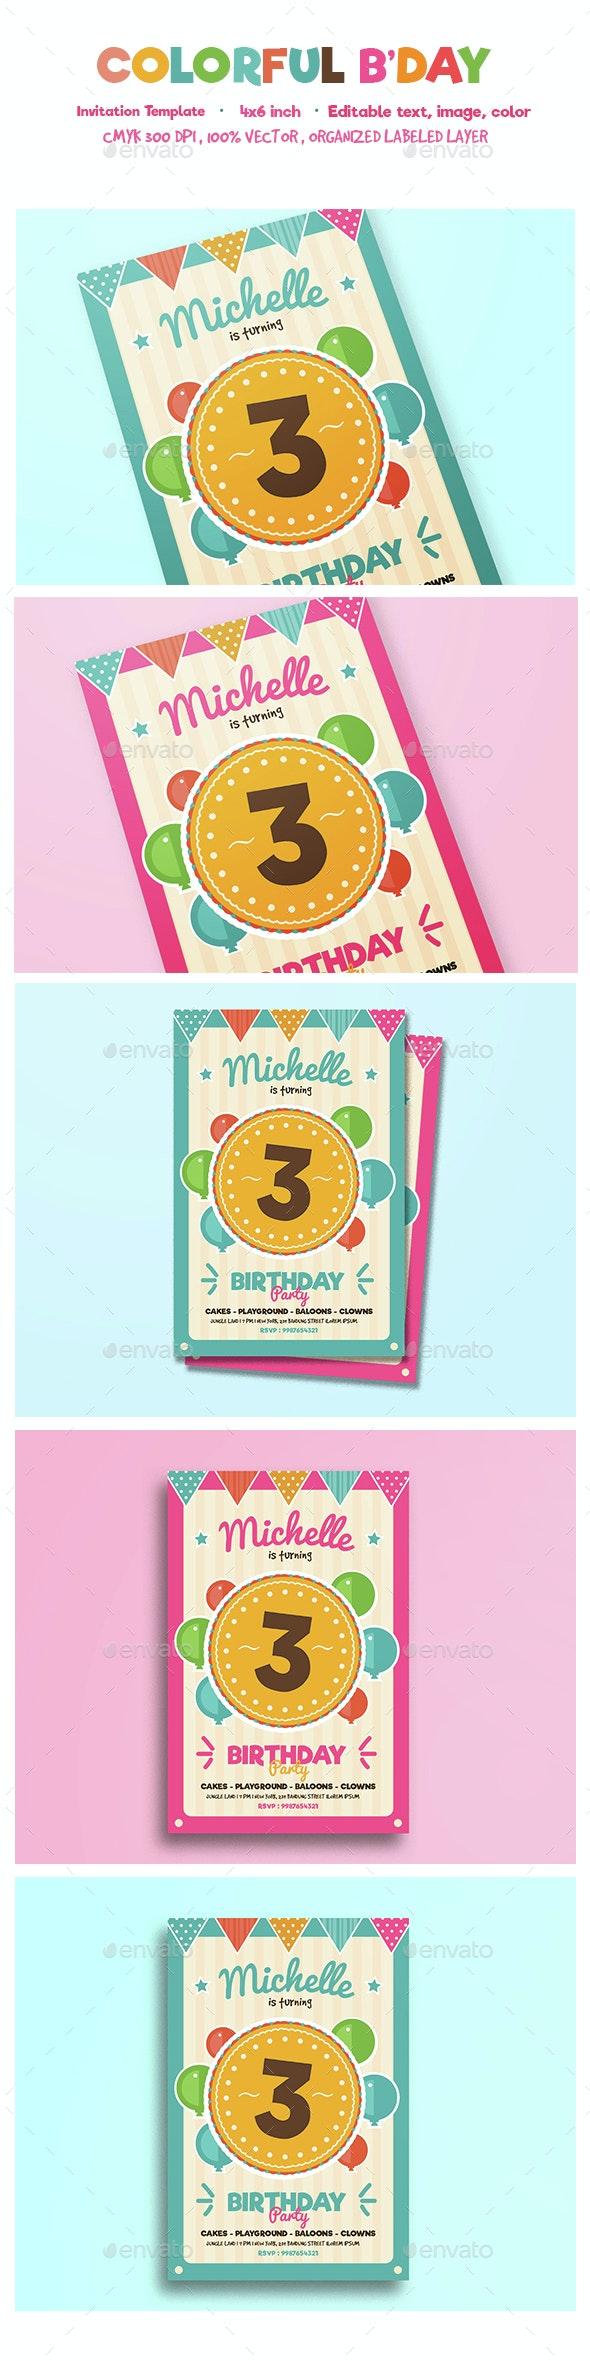 Colorful birthday invitation - Birthday Greeting Cards